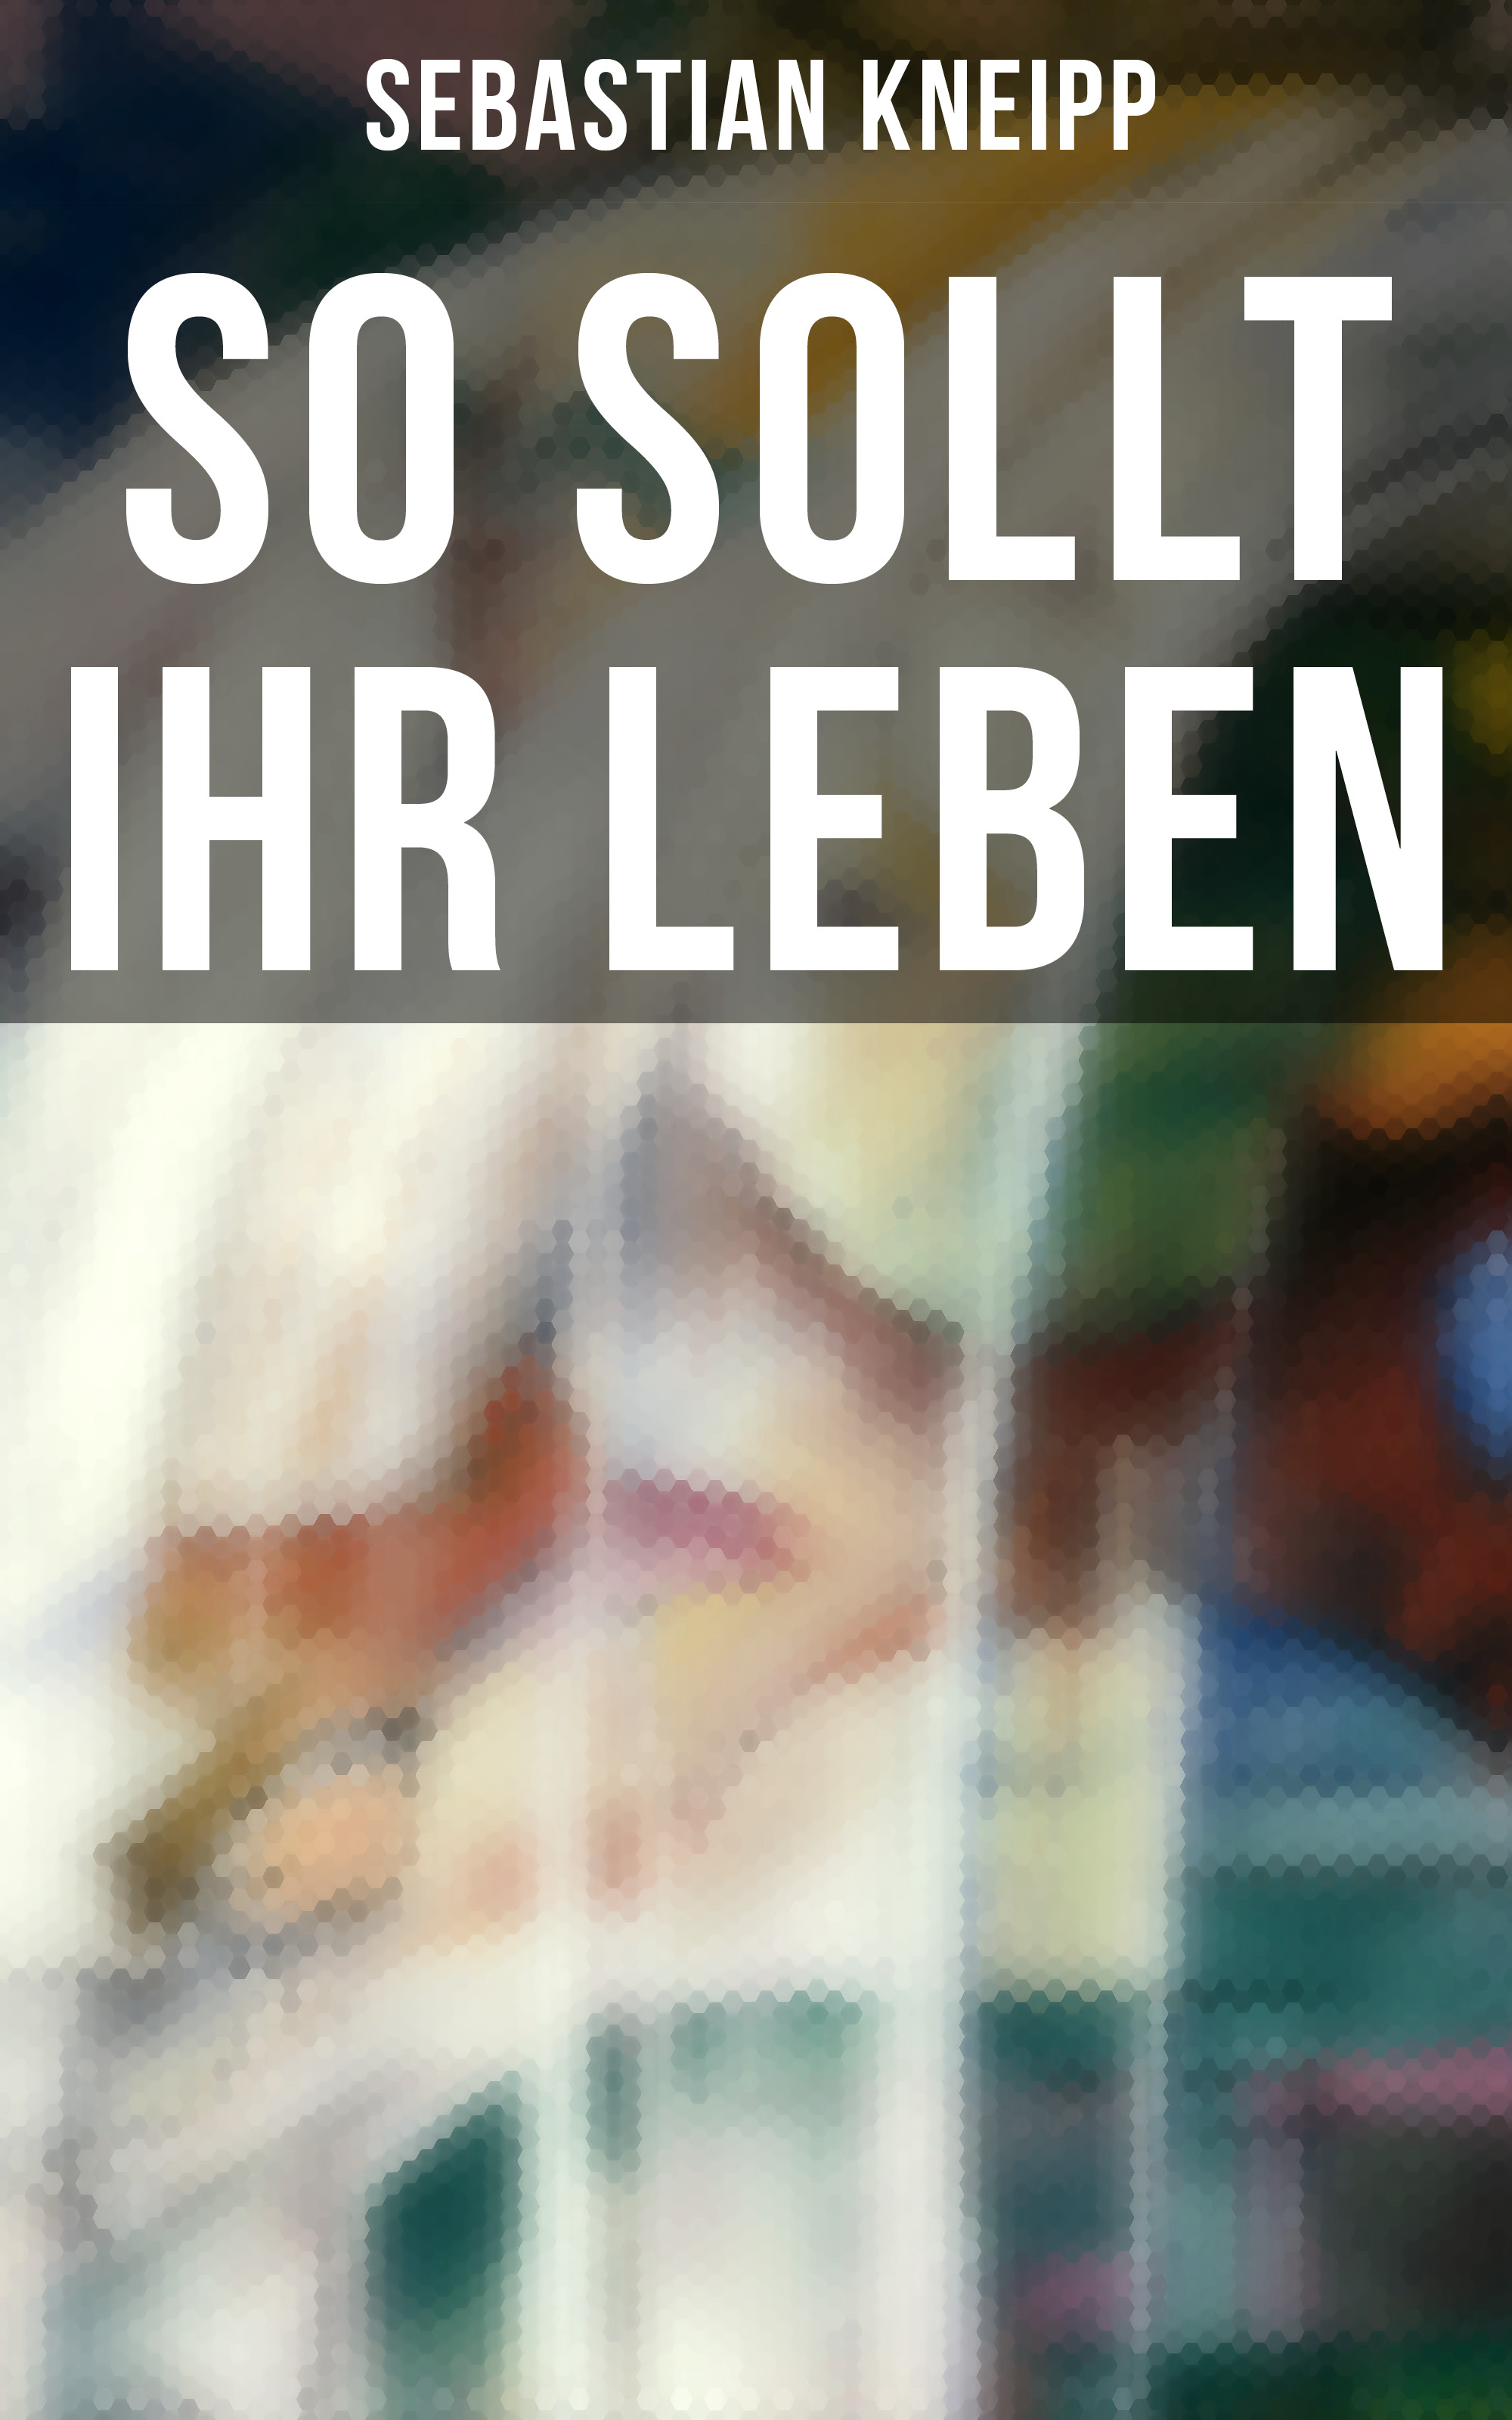 цена на Sebastian Kneipp So sollt ihr leben